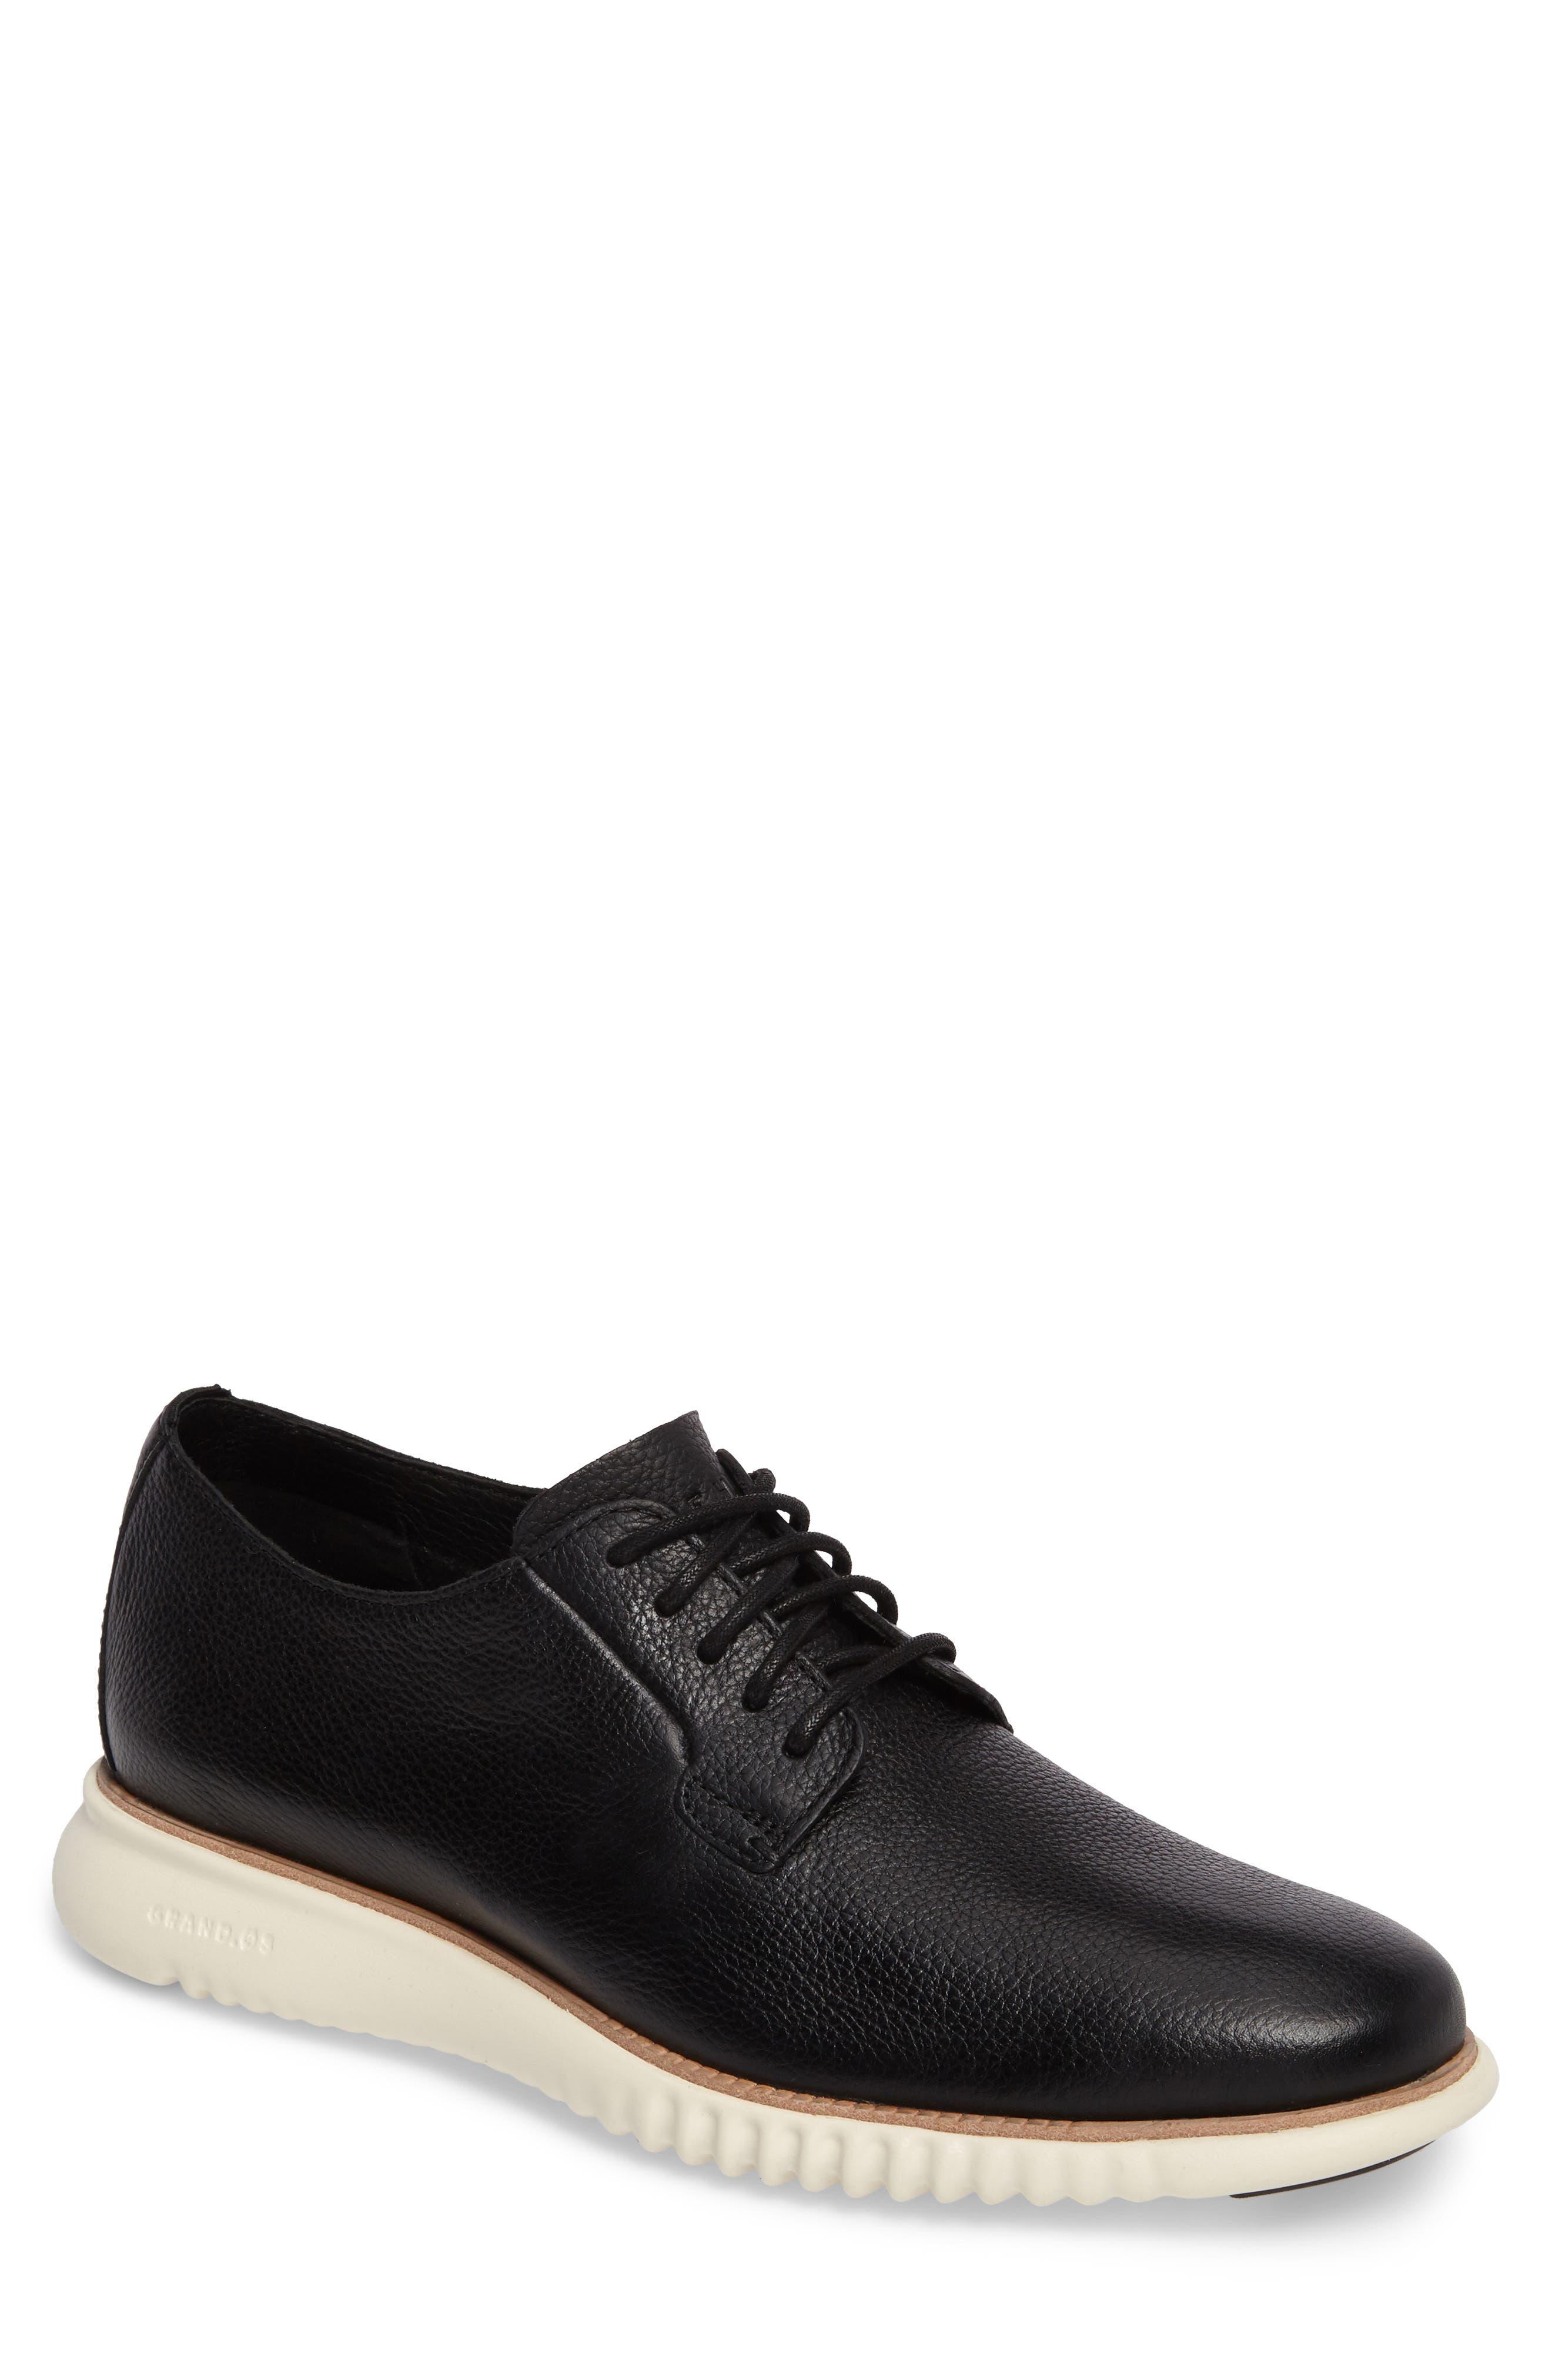 2.ZeroGrand Plain Toe Derby,                             Main thumbnail 1, color,                             Black/ Ivory Leather